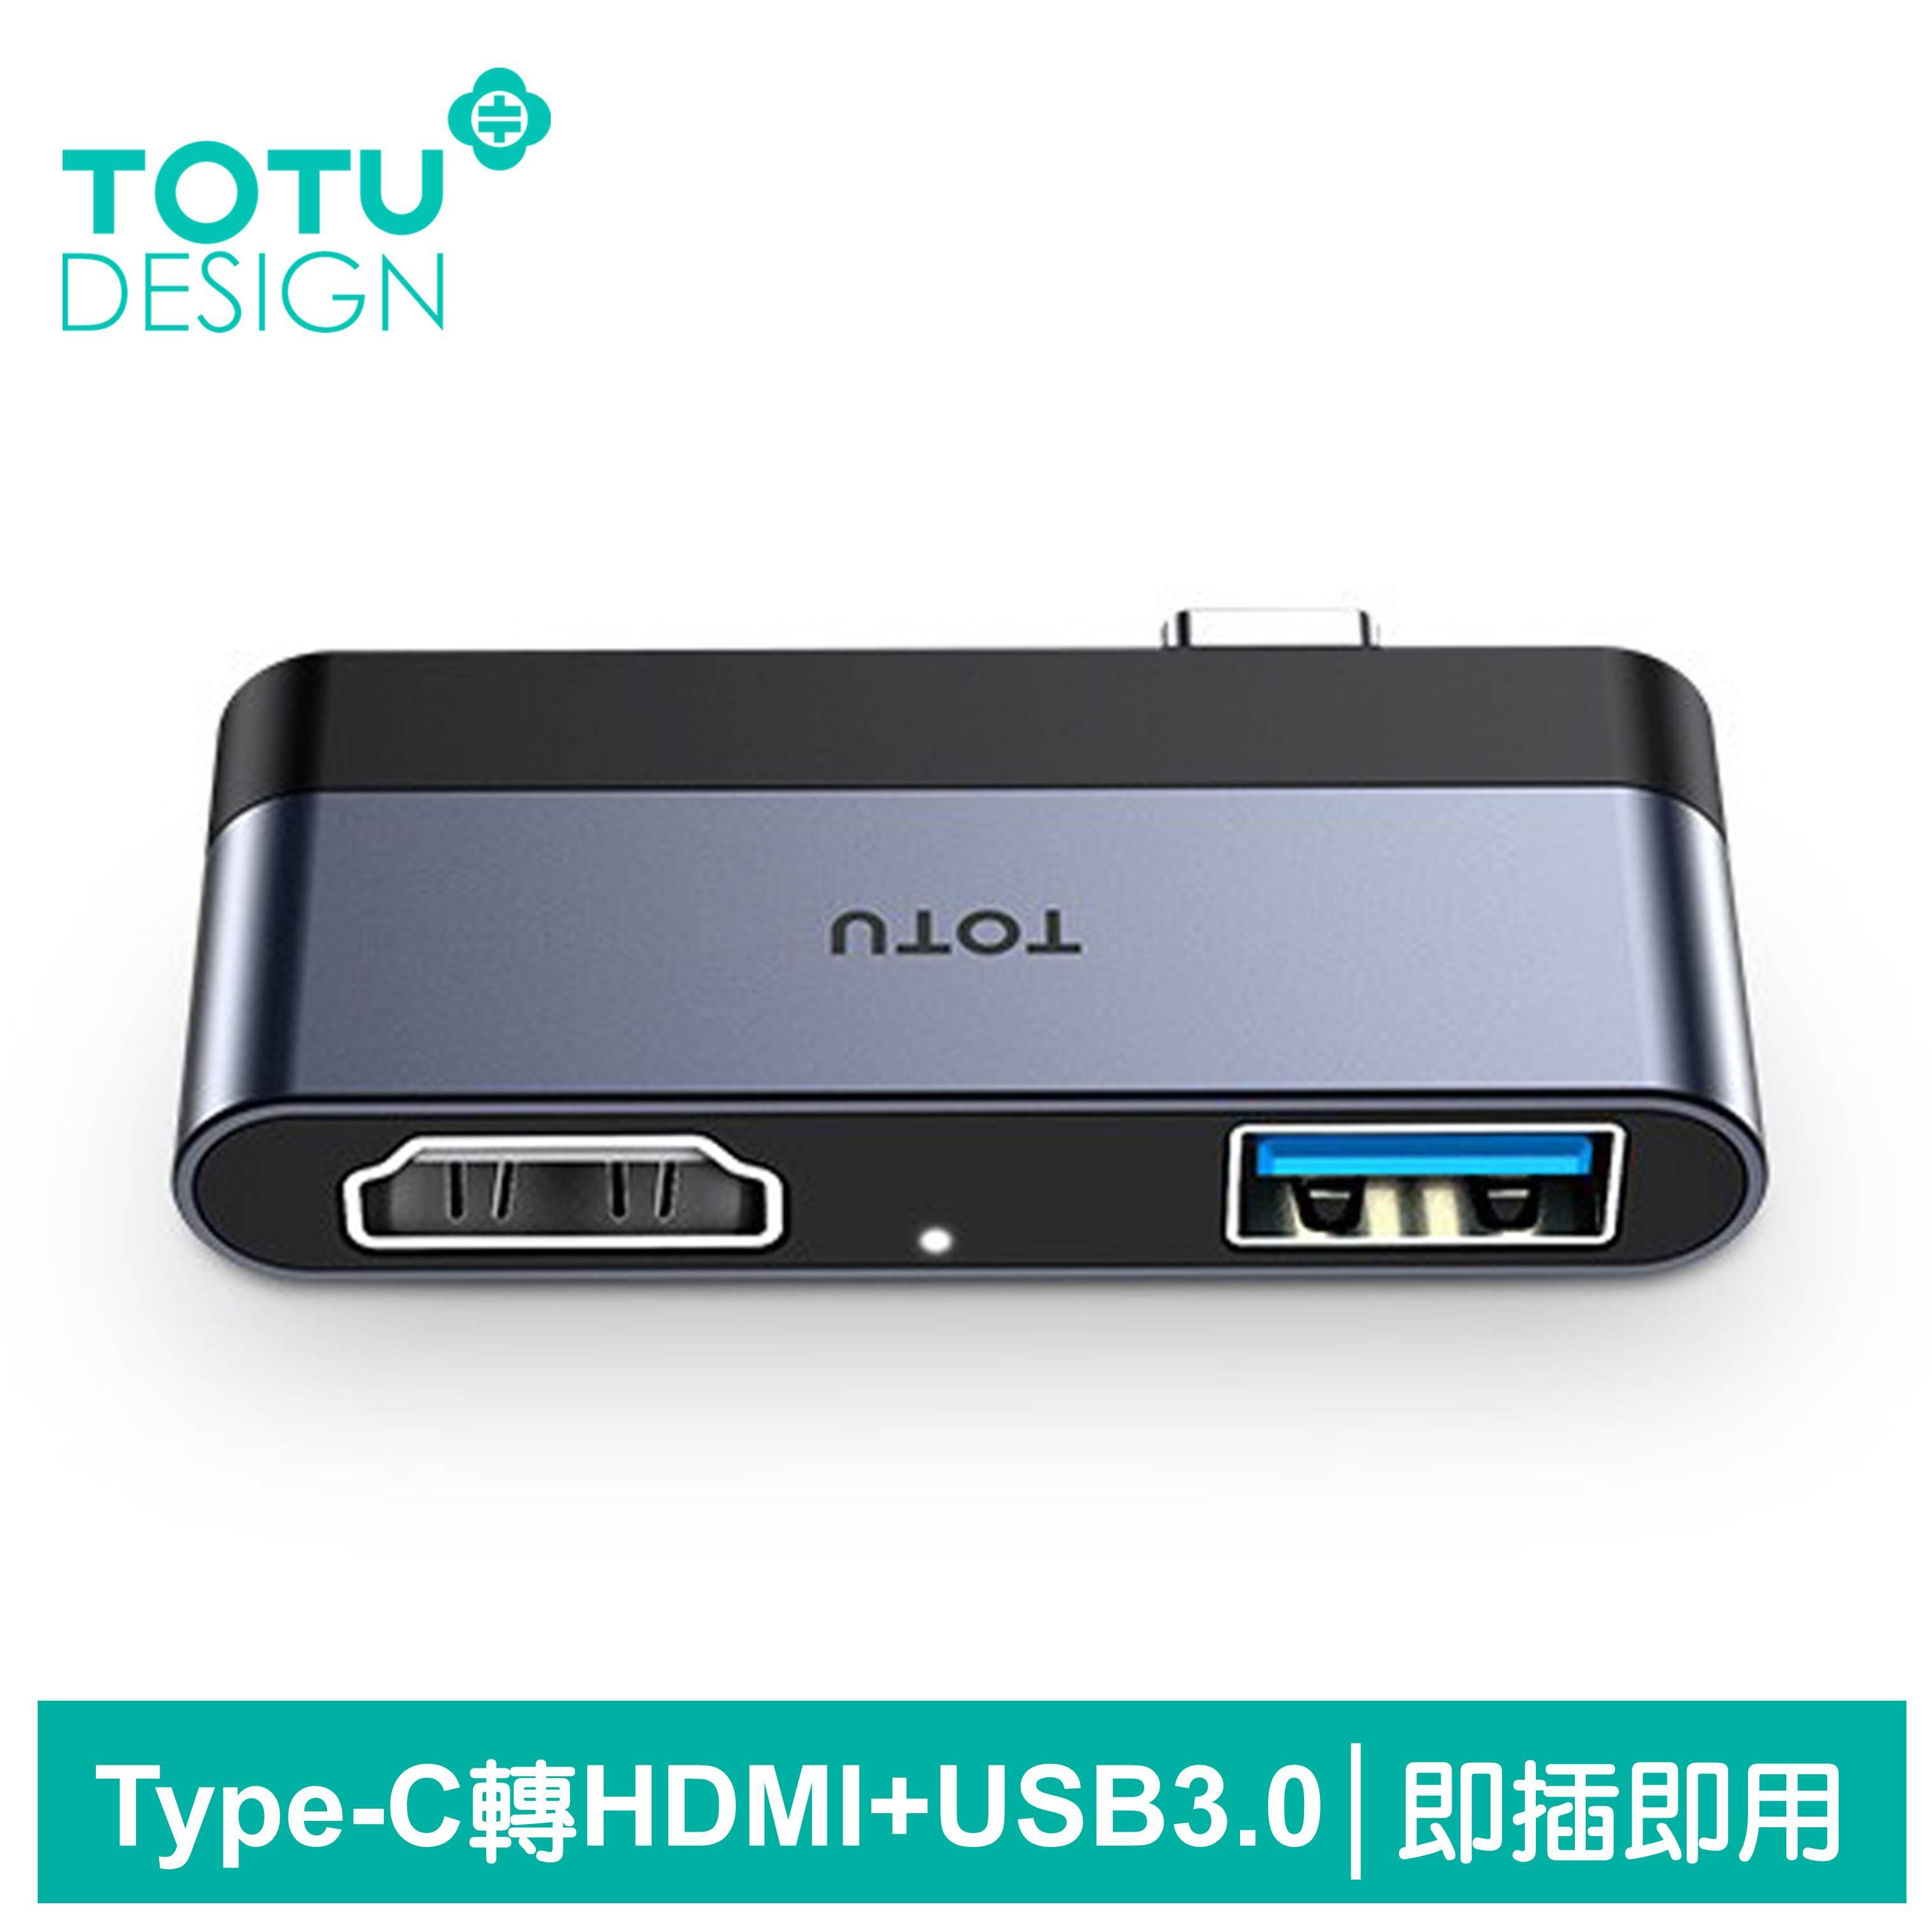 TOTU台灣官方 Type-C 轉接頭 HDMI USB3.0 轉接器 擴展器 轉接線 拓展塢 4K 電視 玲瓏系列